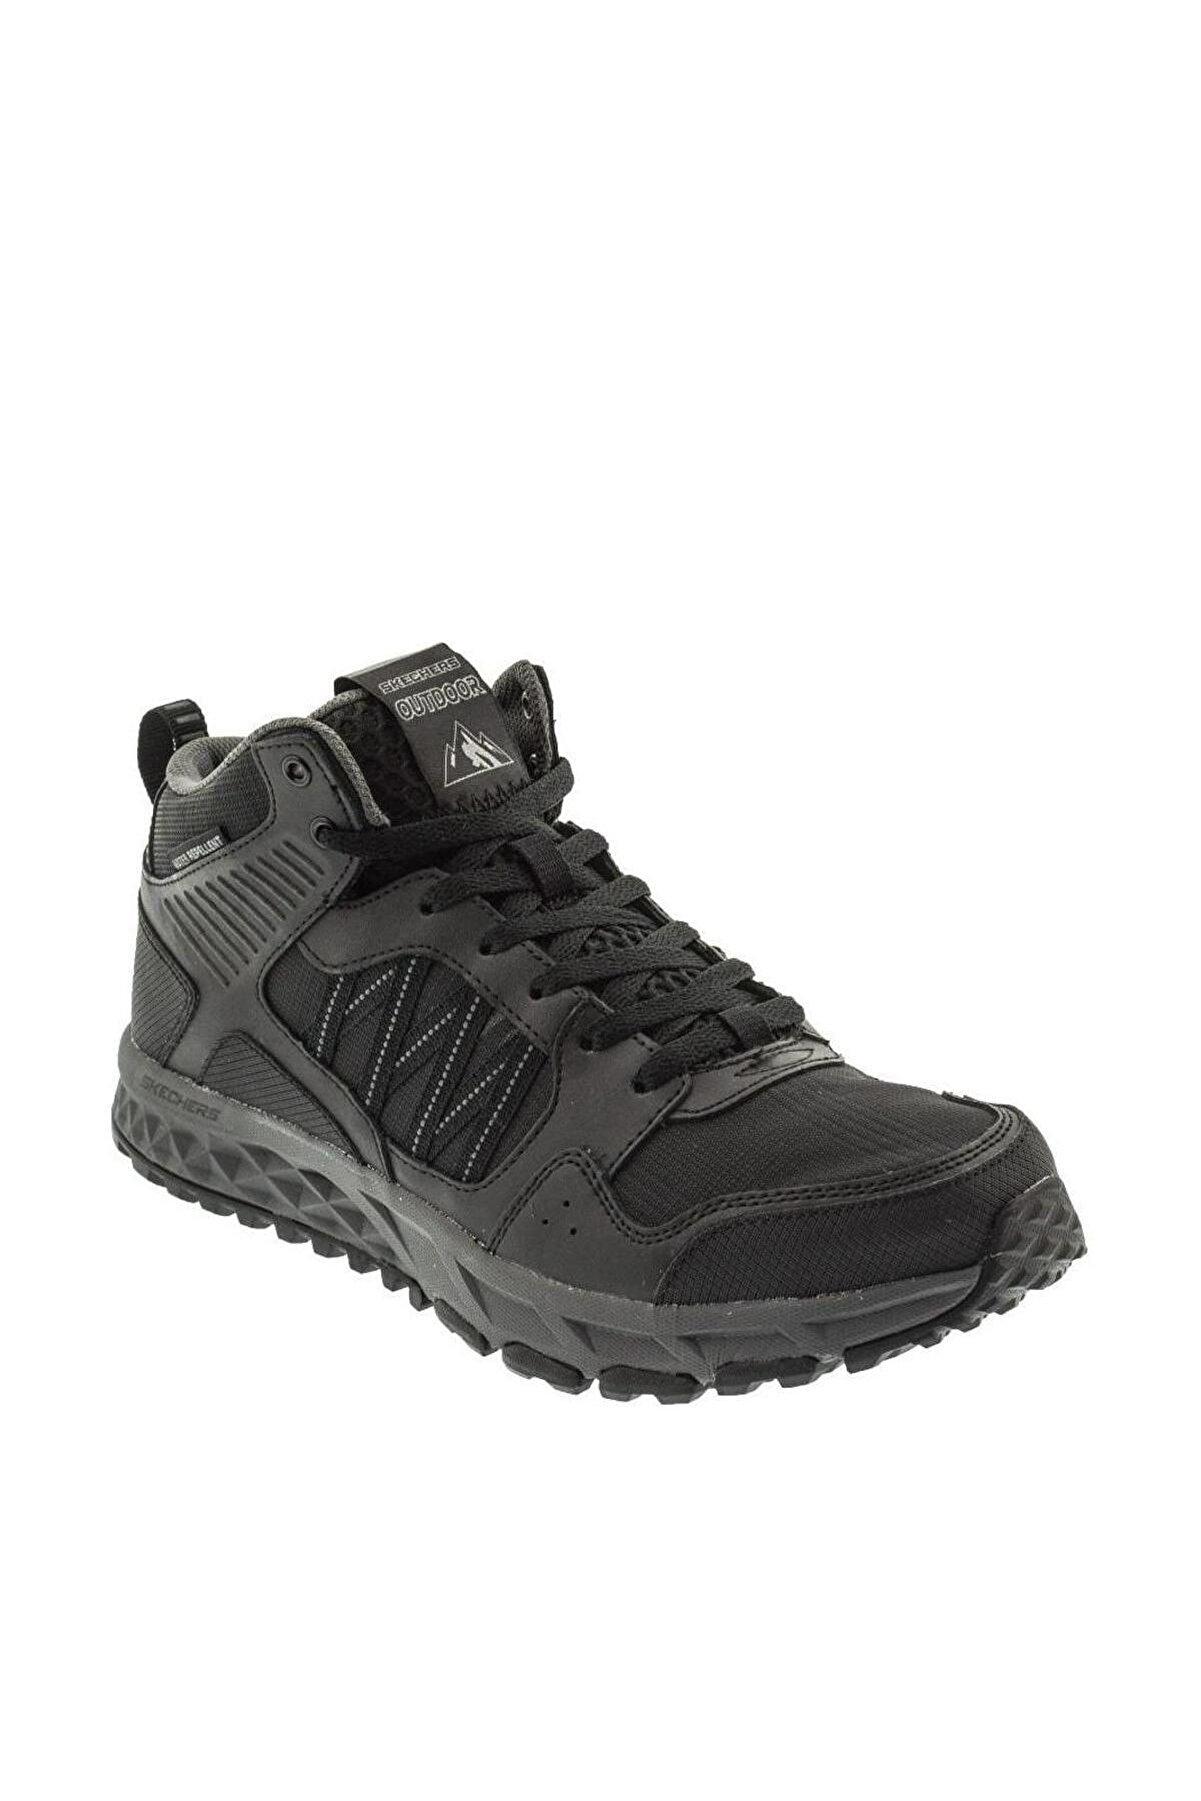 Skechers Erkek Siyah Outdoor Ayakkabı -  ESCAPE PLAN SECOND BITE - 51592BKCC